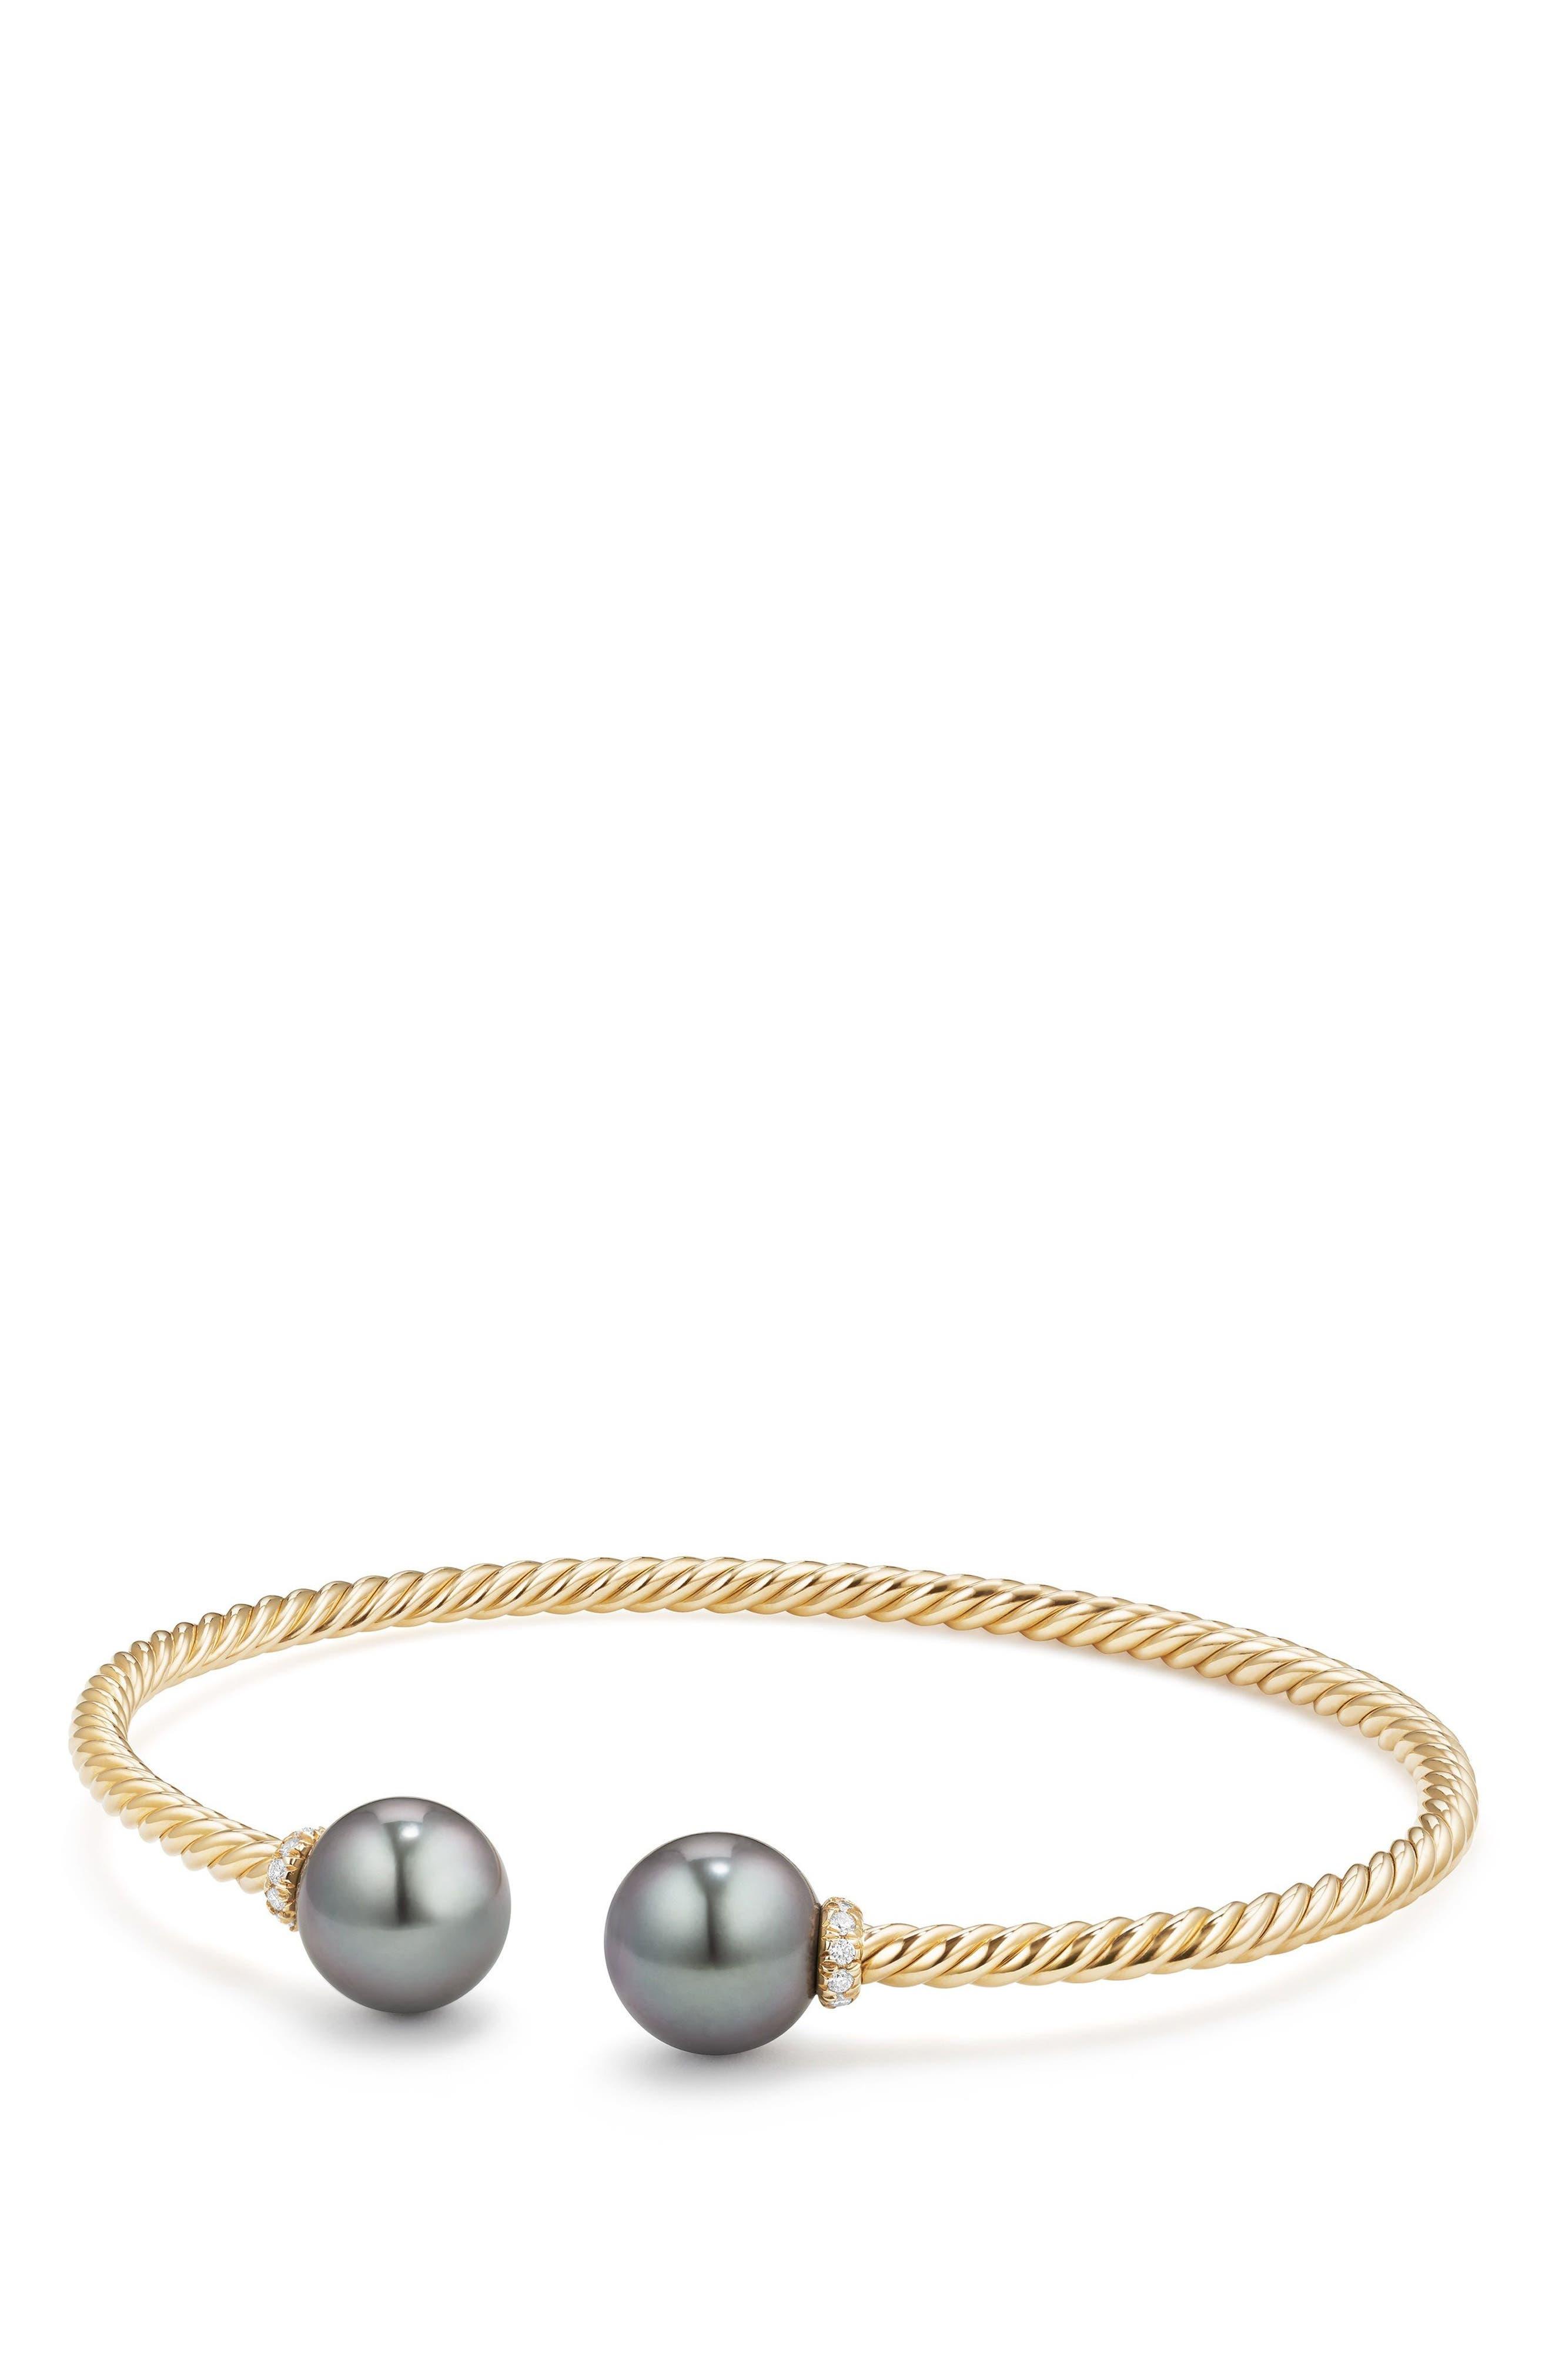 Solari Bead Bracelet with Diamonds,                             Main thumbnail 1, color,                             Gold/ Diamond/ Grey Pearl